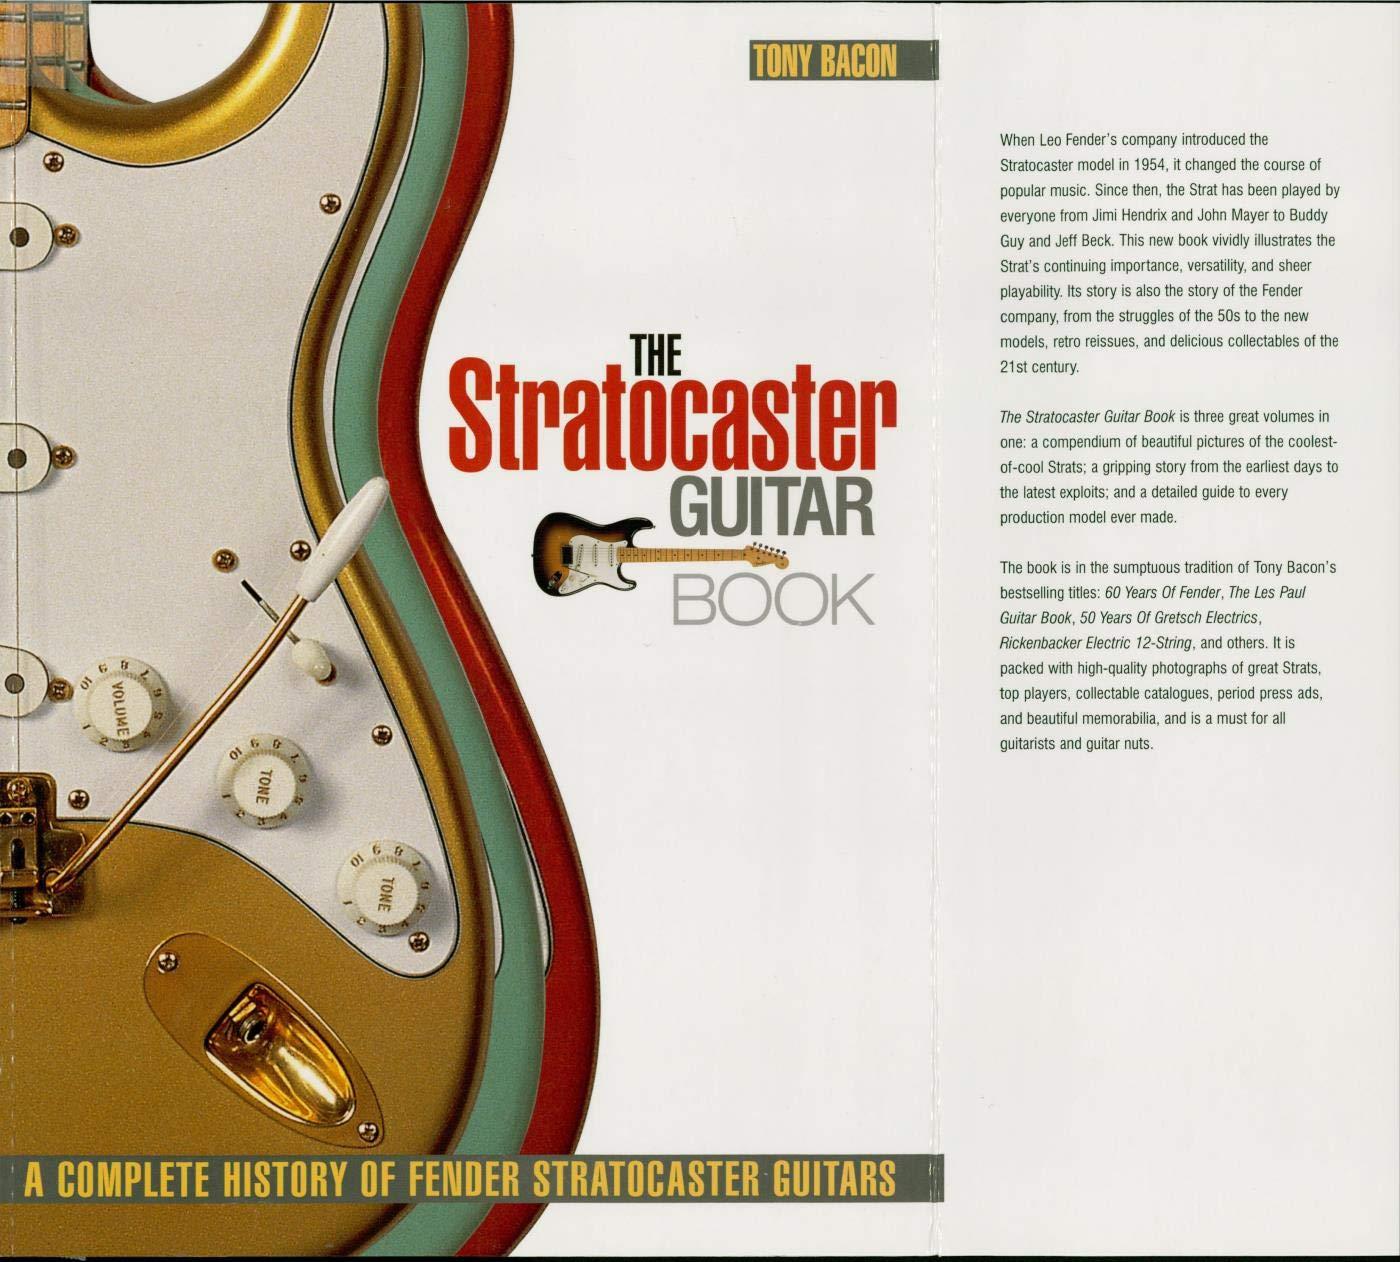 The Stratocaster Guitar Book: A Complete History of Fender Stratocaster Guitars (Guitar Reference) (English Edition) eBook: Bacon, Tony: Amazon.es: Tienda Kindle